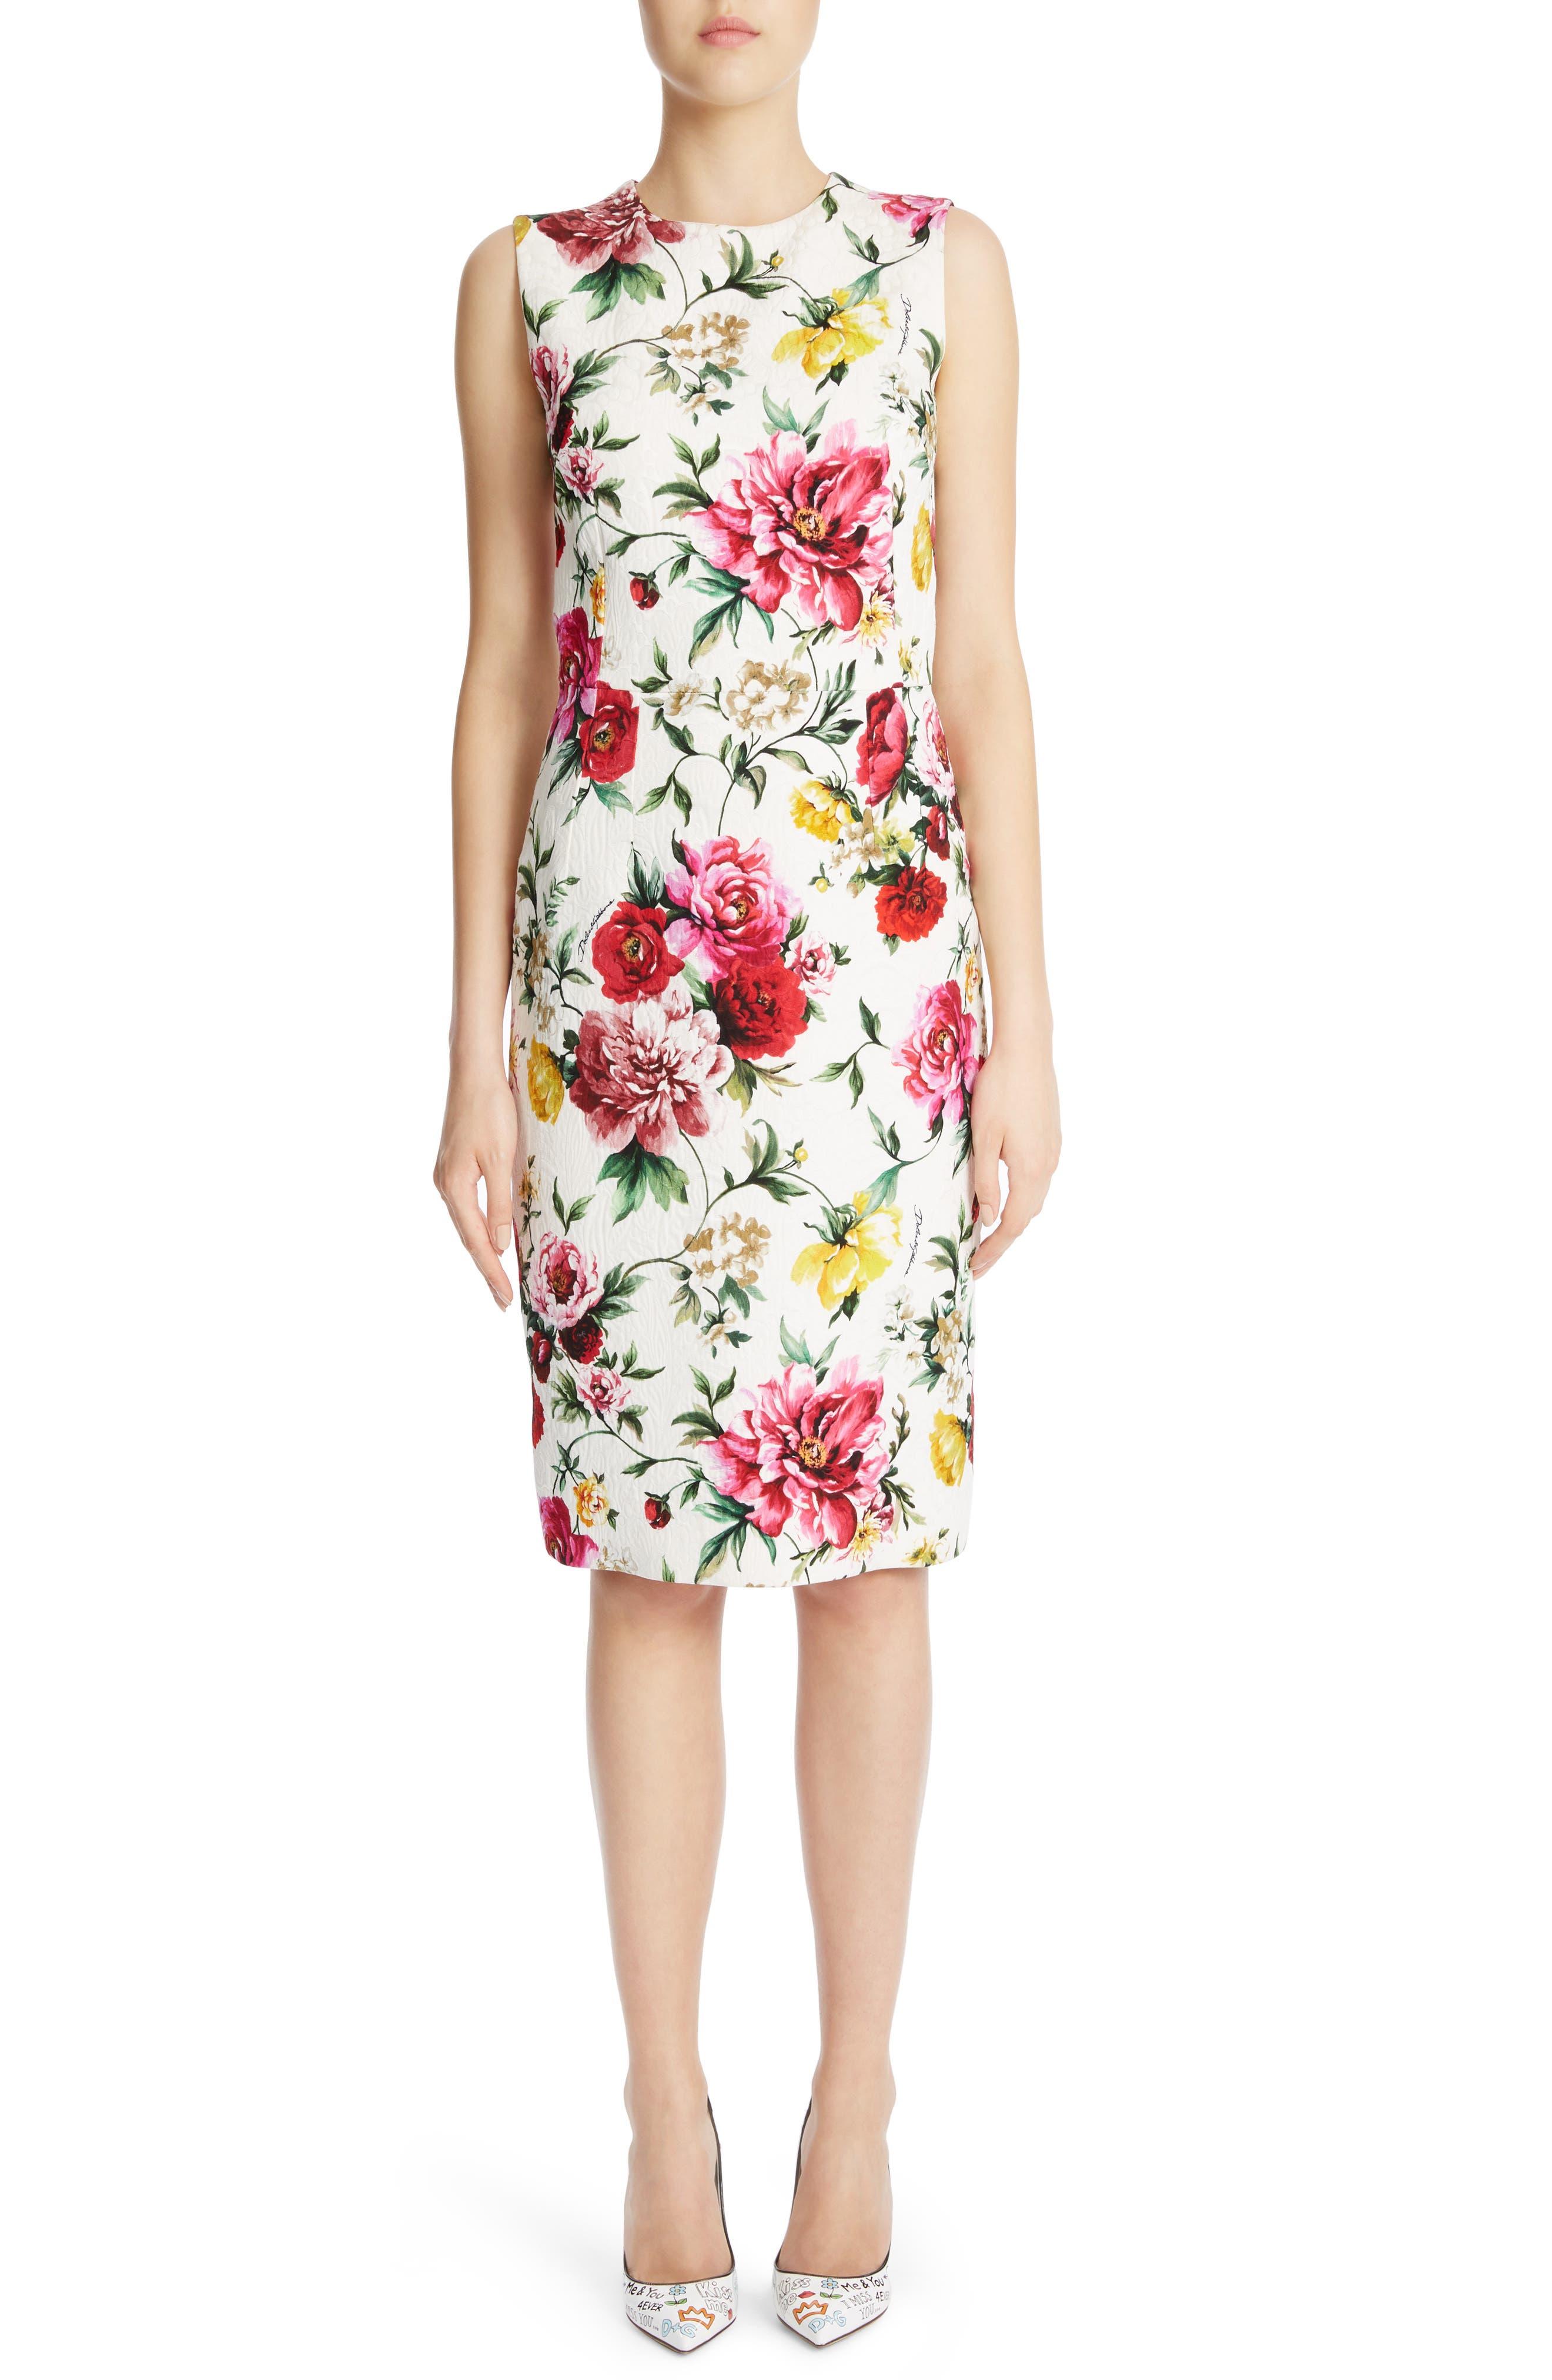 Dolce&Gabbana Floral Print Jacquard Sheath Dress